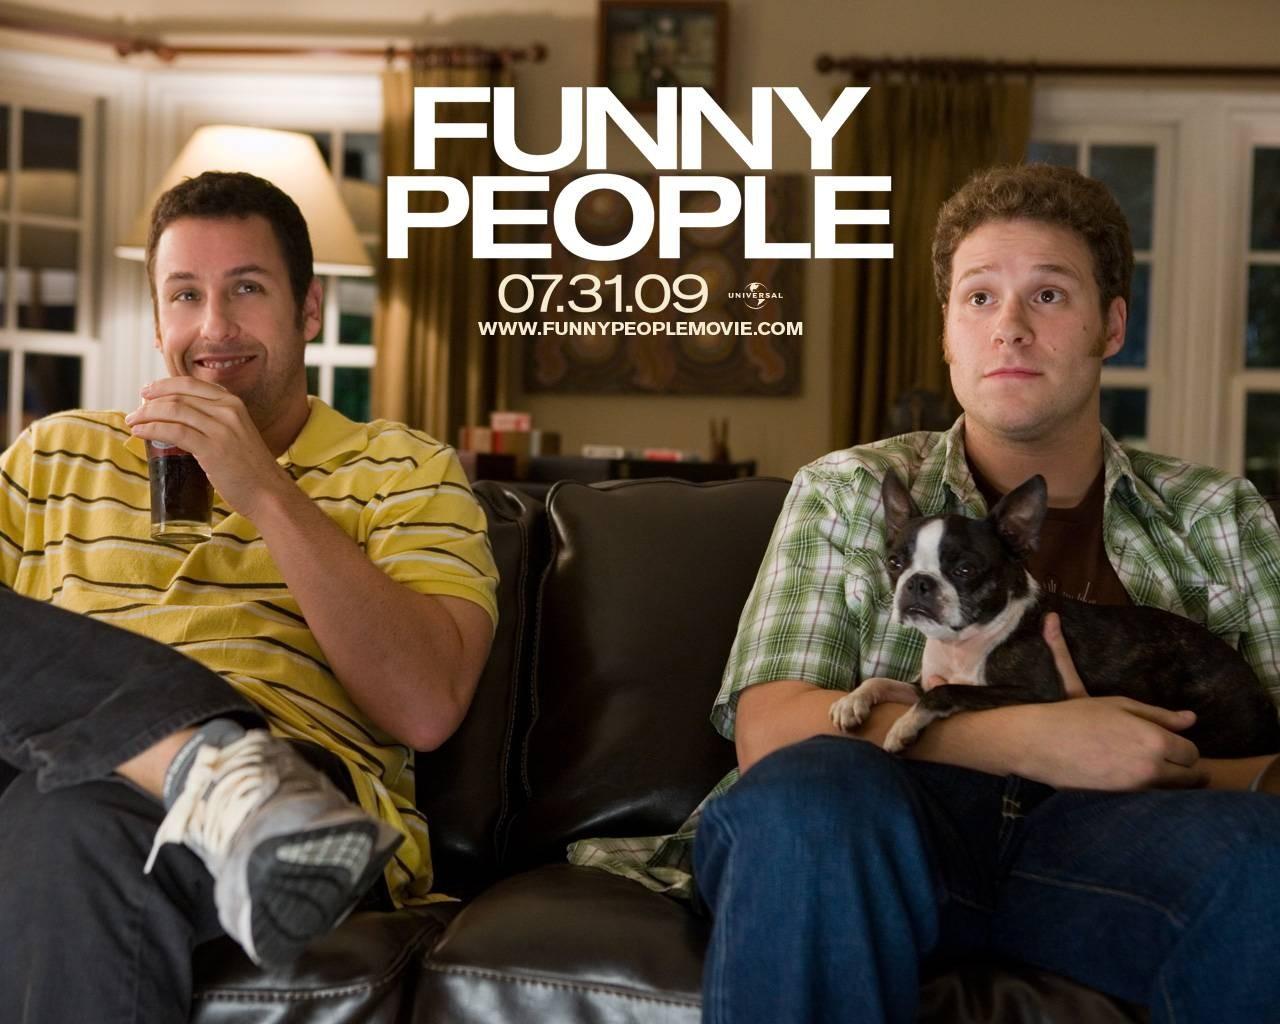 Wallpaper del film Funny People con Adam Sandler e Seth Rogen